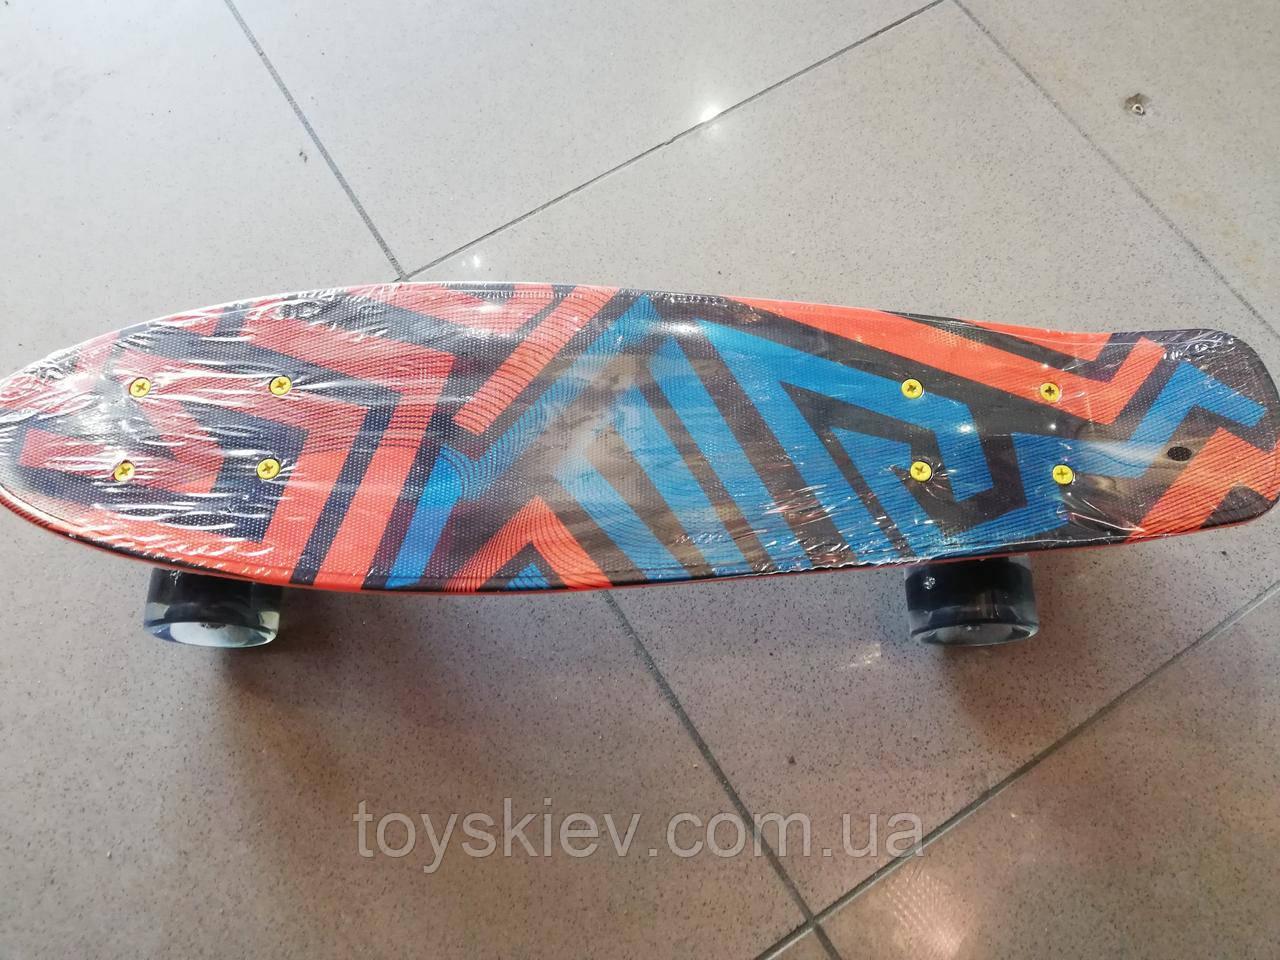 Скейт Пенни борд (Penny board) 820-24 с рисунком, светящийся